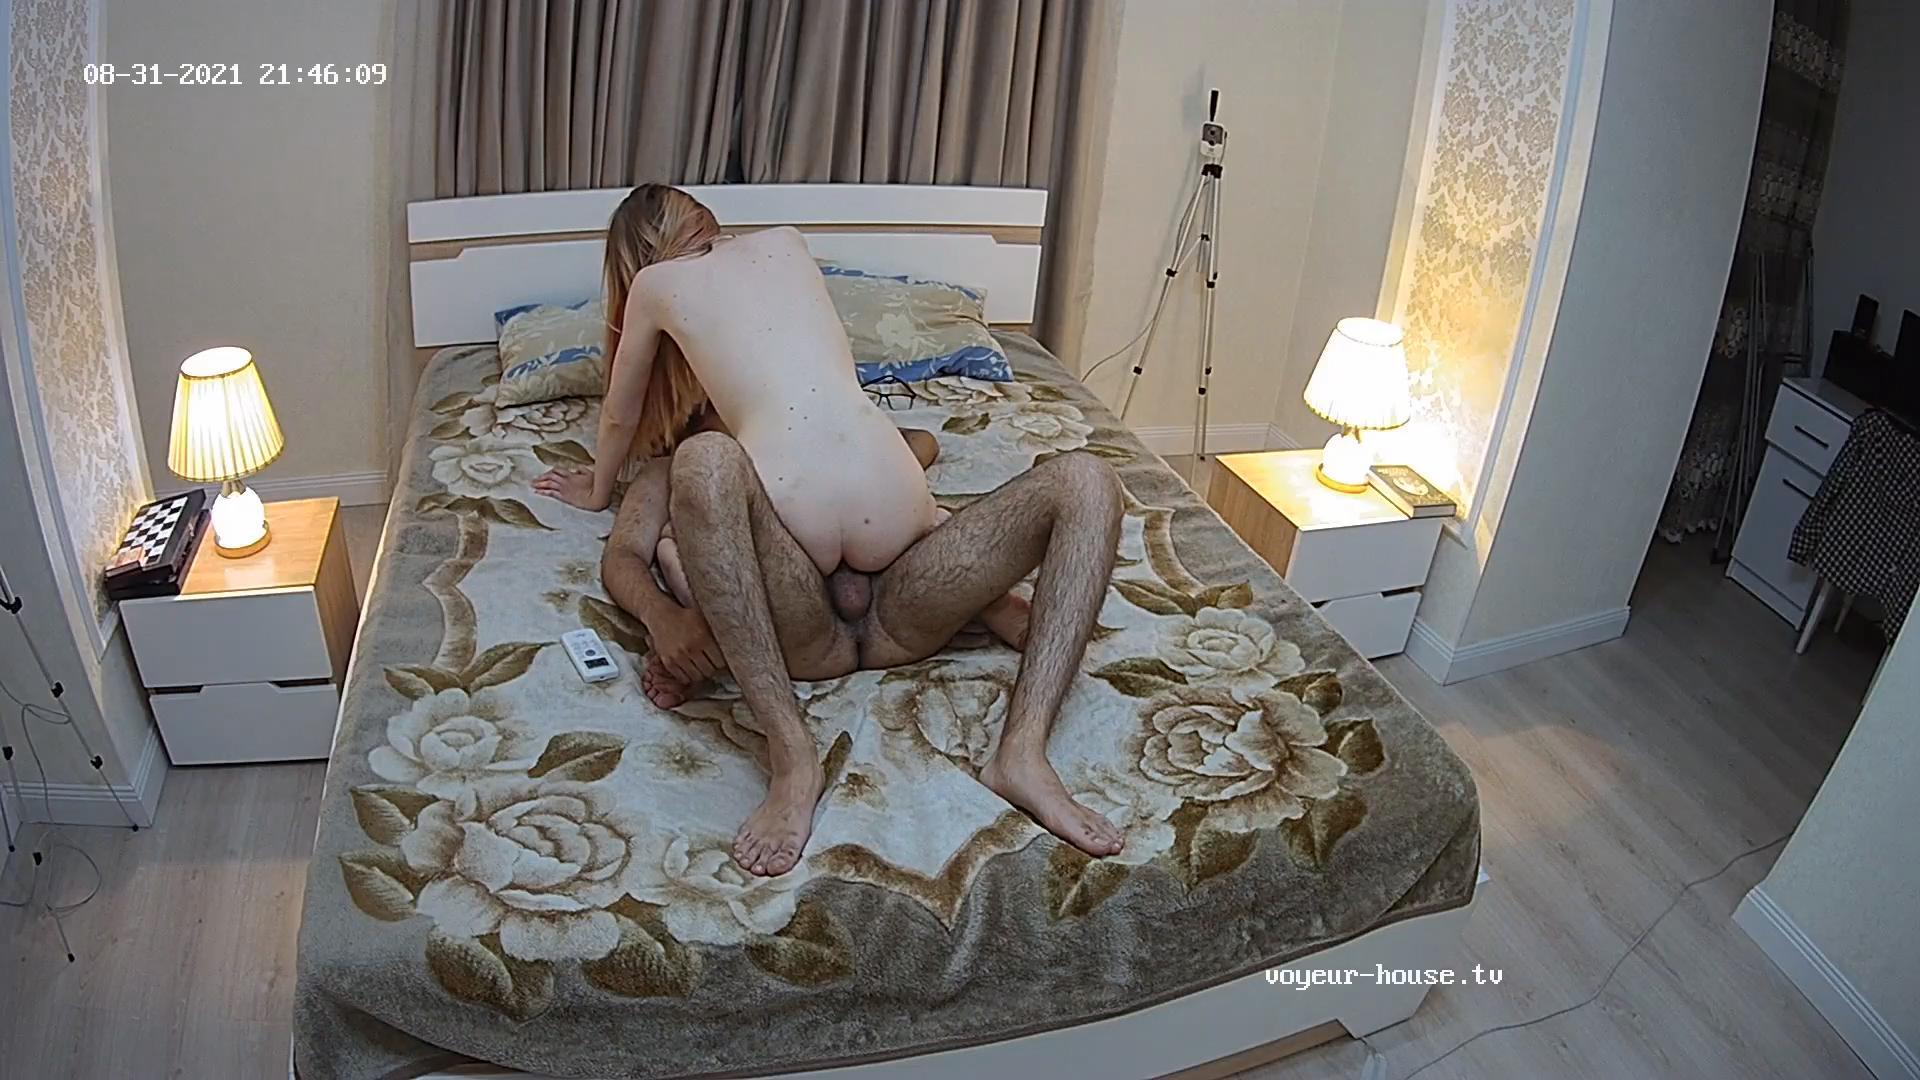 Demira Myagi sex round one 31 Aug 2021